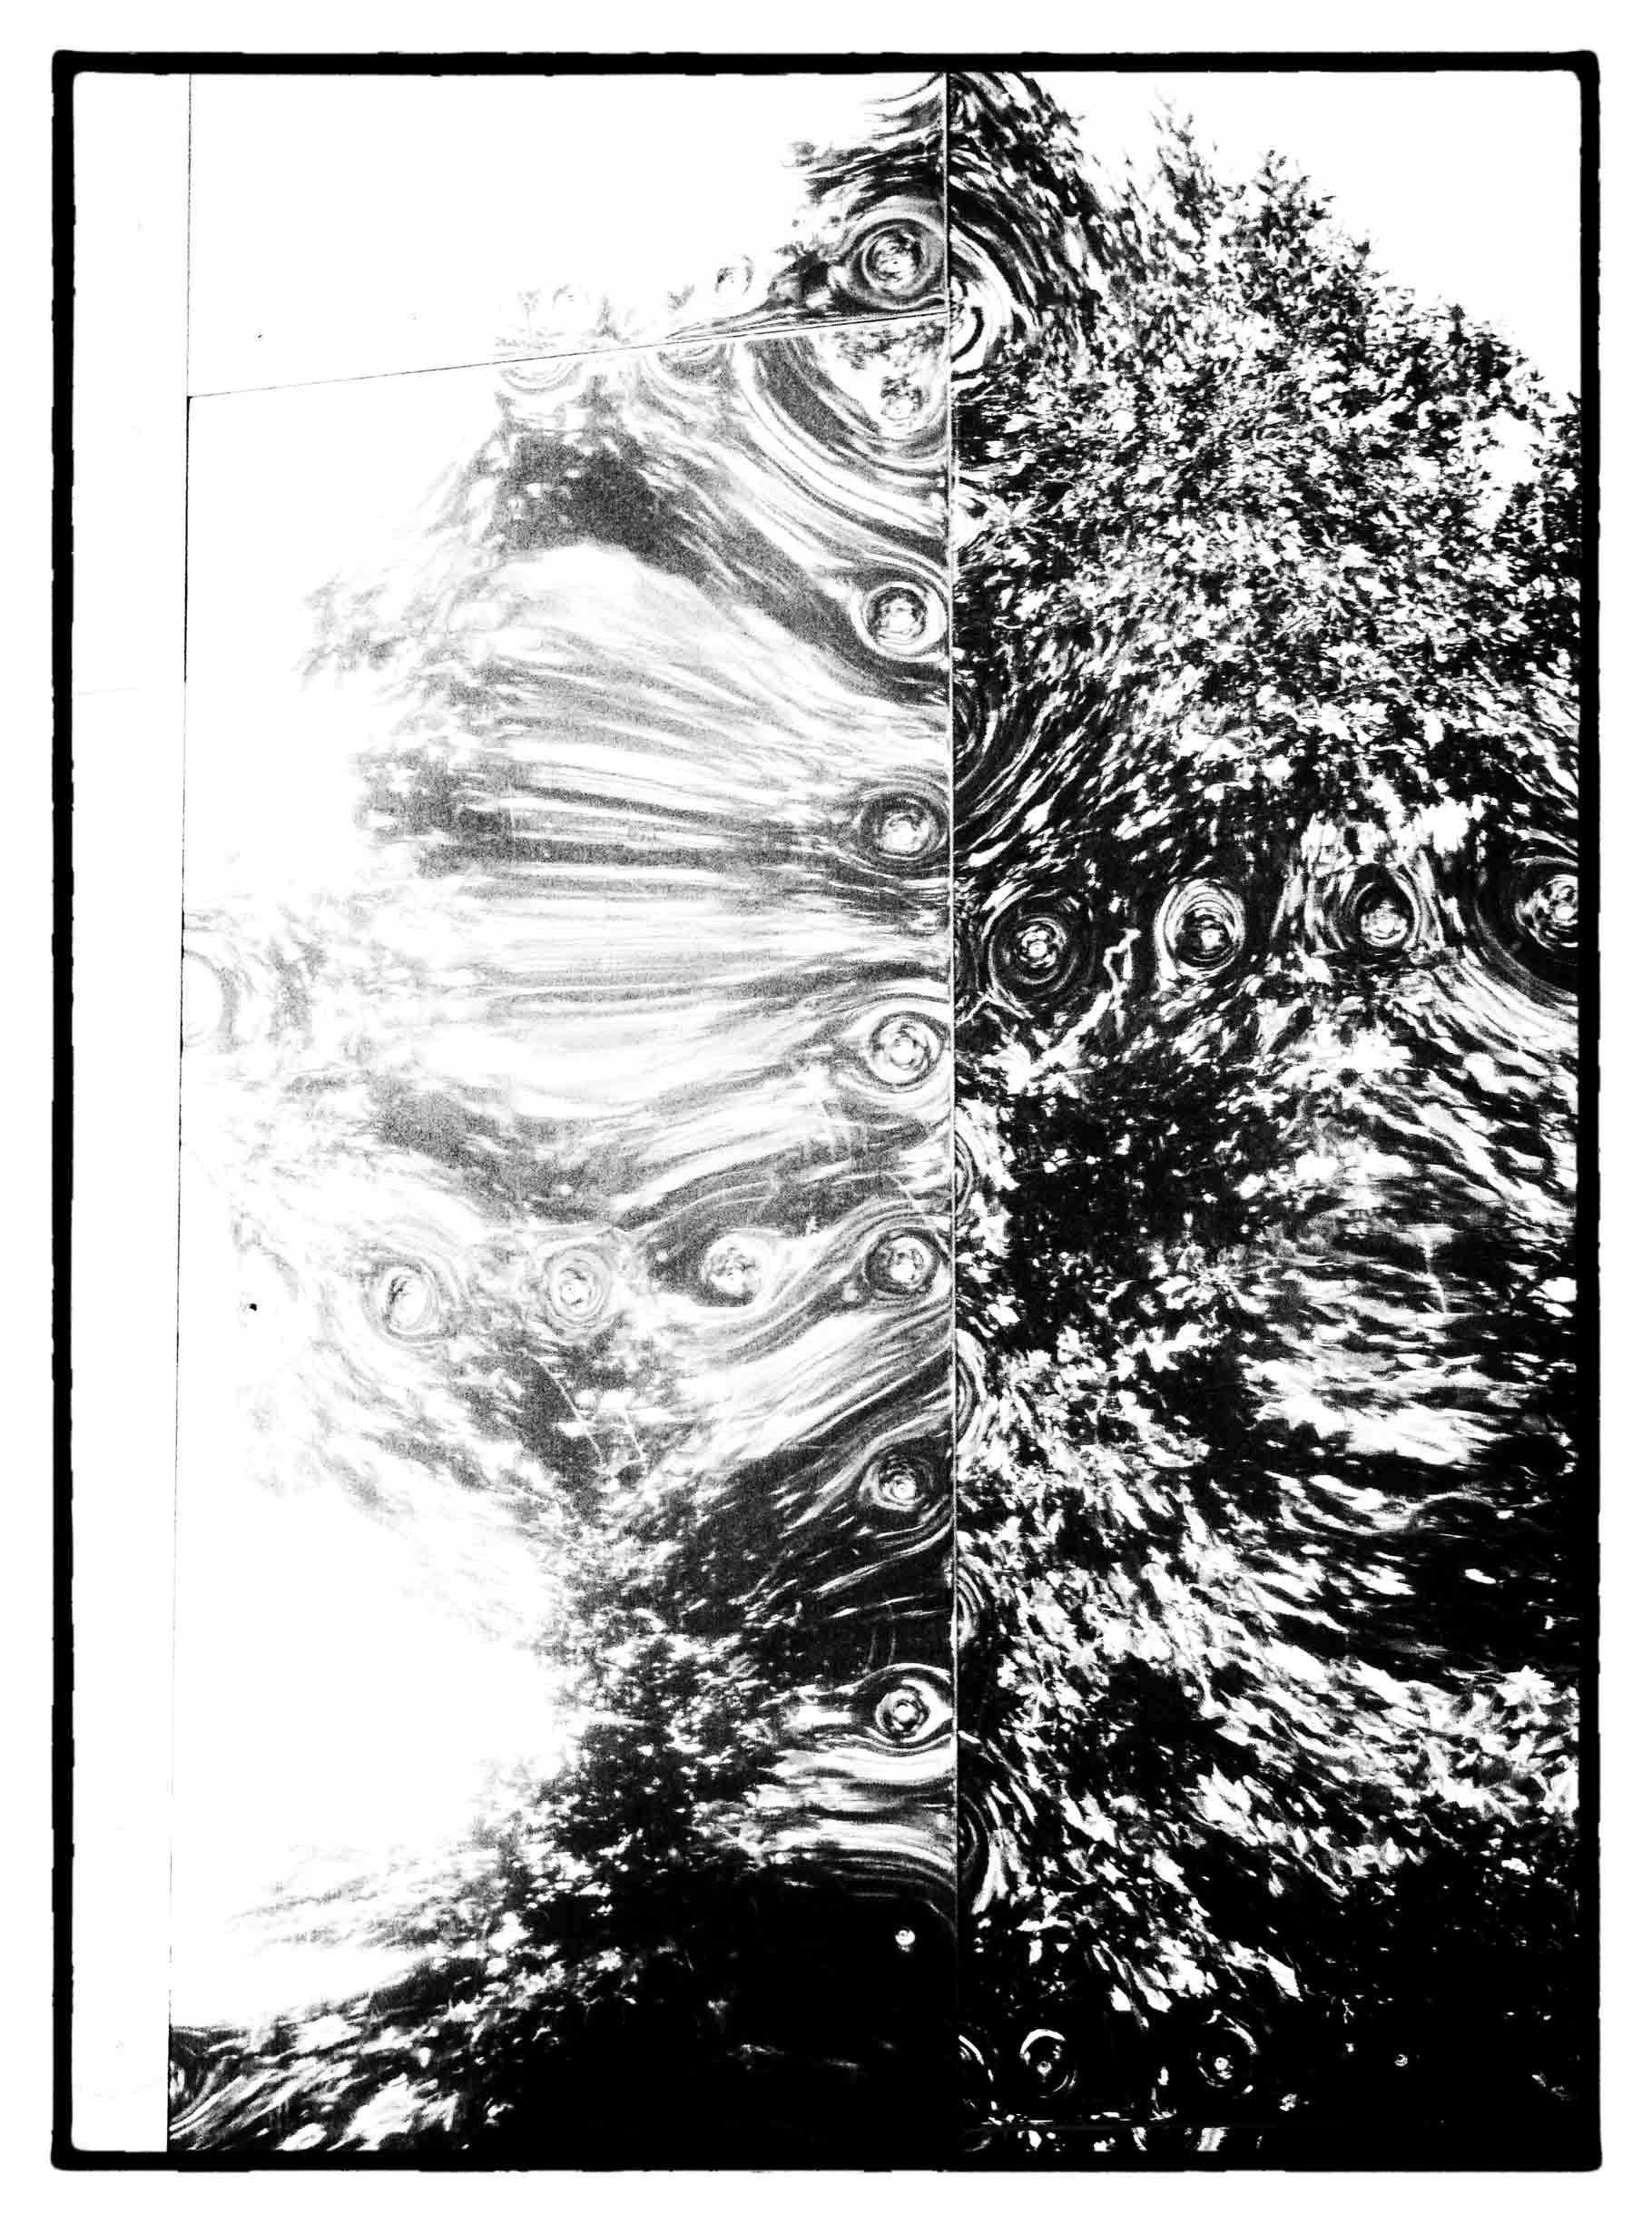 Abstract B&W image